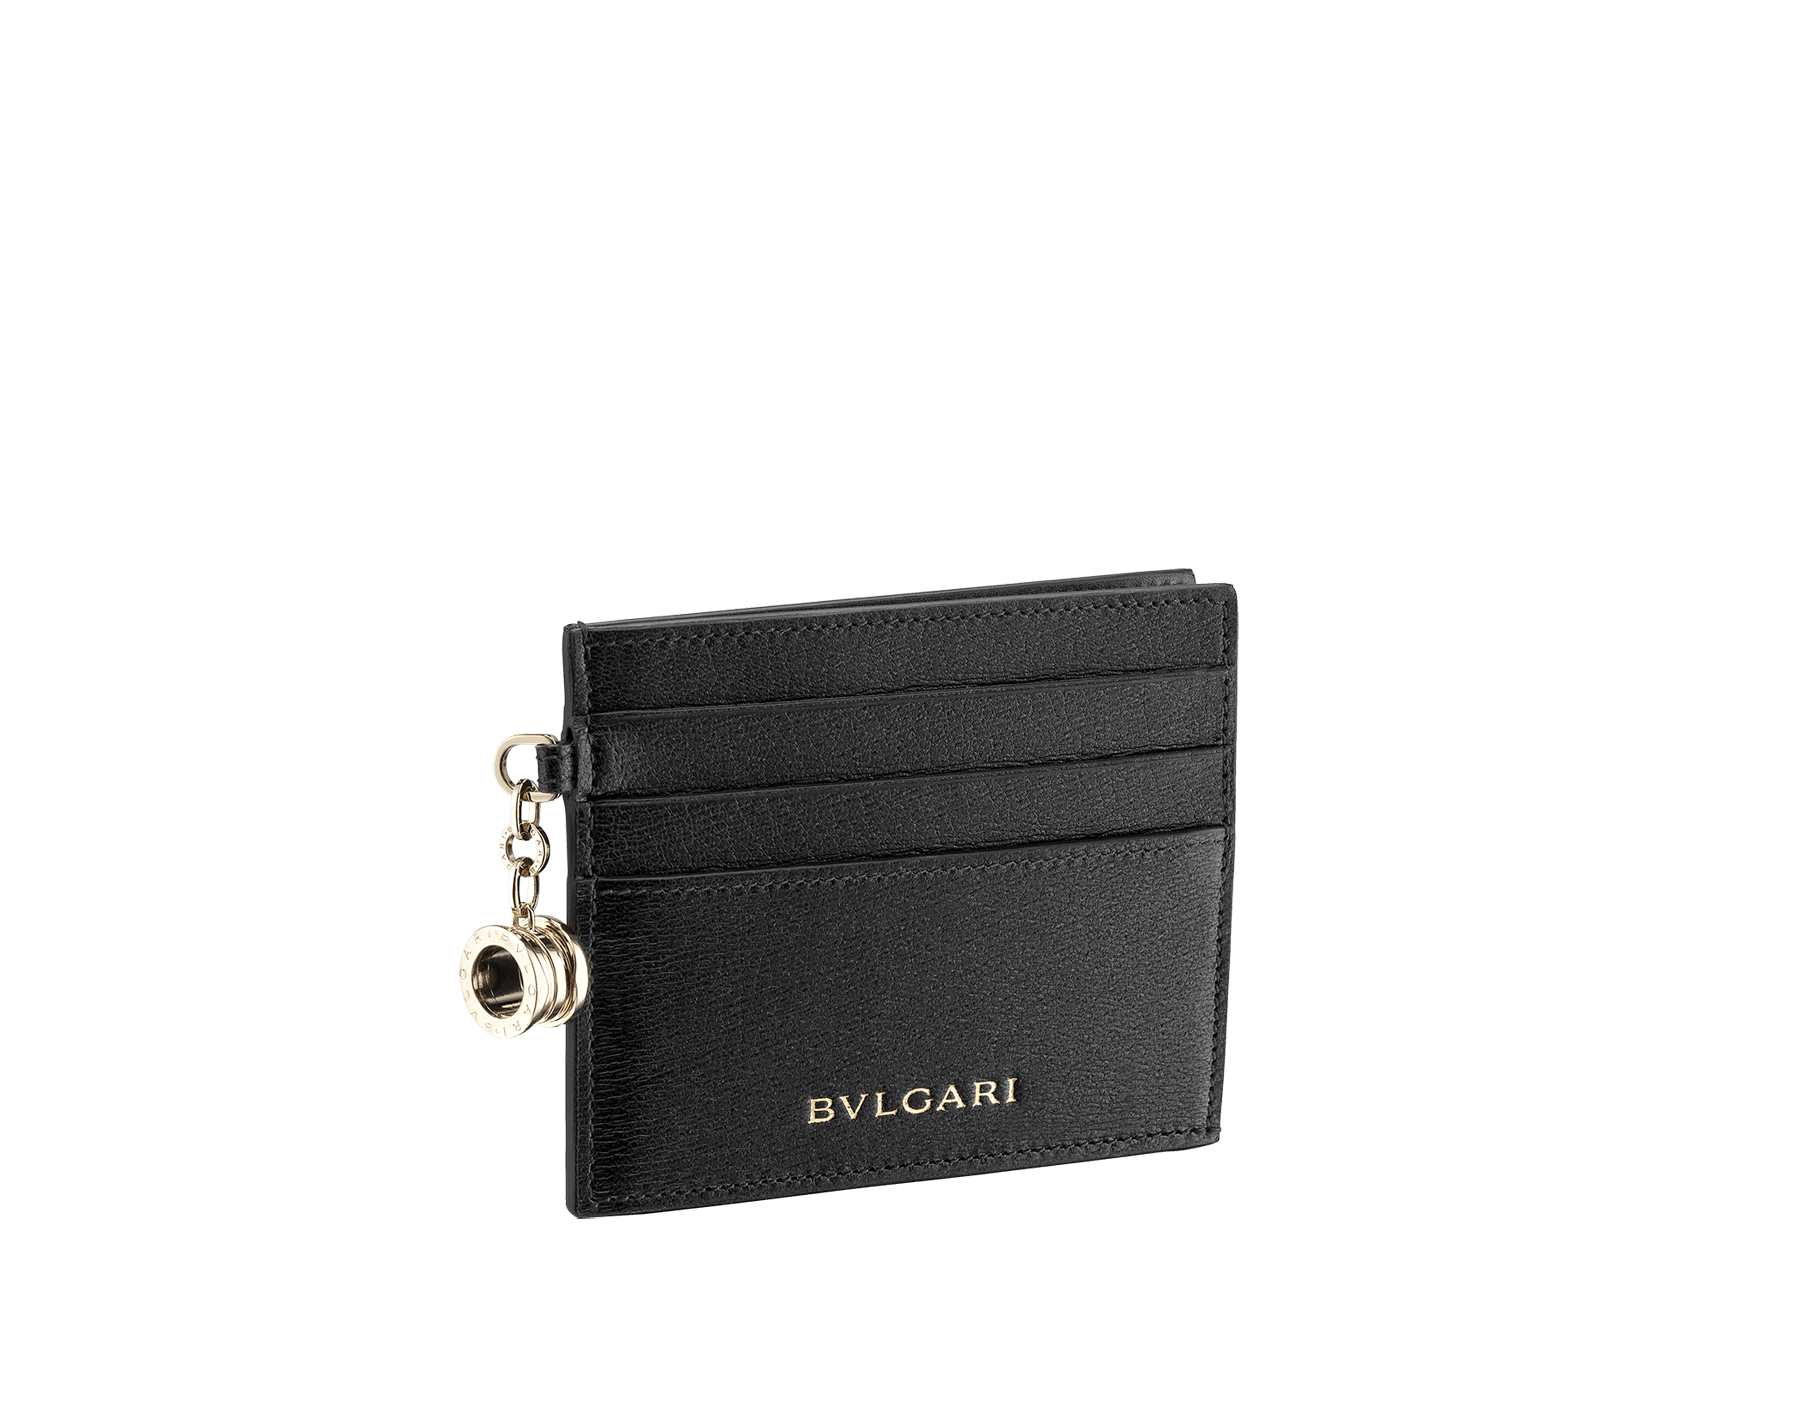 B.zero1 open credit card holder in black goatskin. Iconic B.zero1 charm in light gold plated brass. 288232 image 2